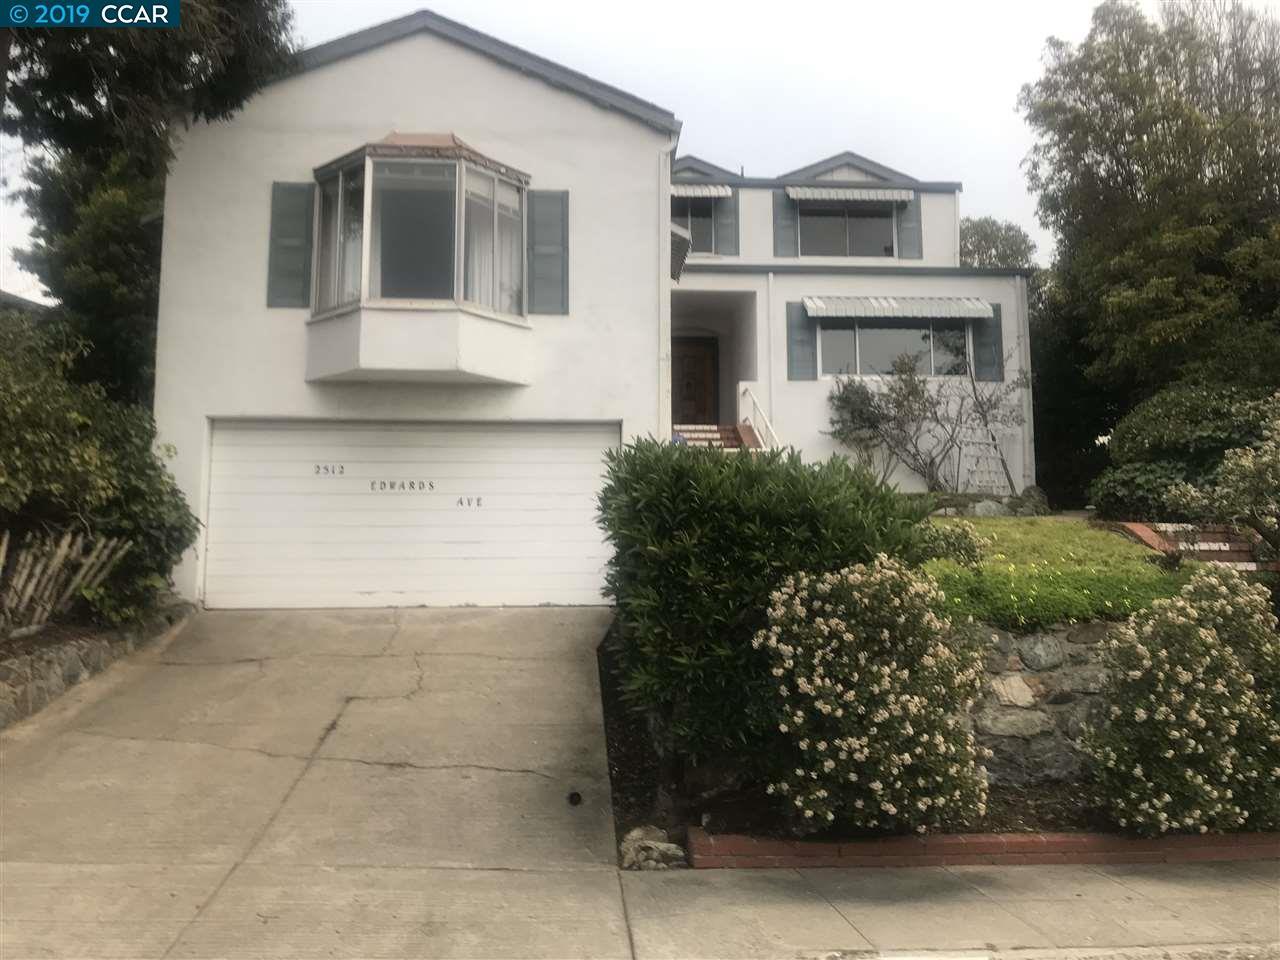 2512 Edwards Ave El Cerrito, CA 94530